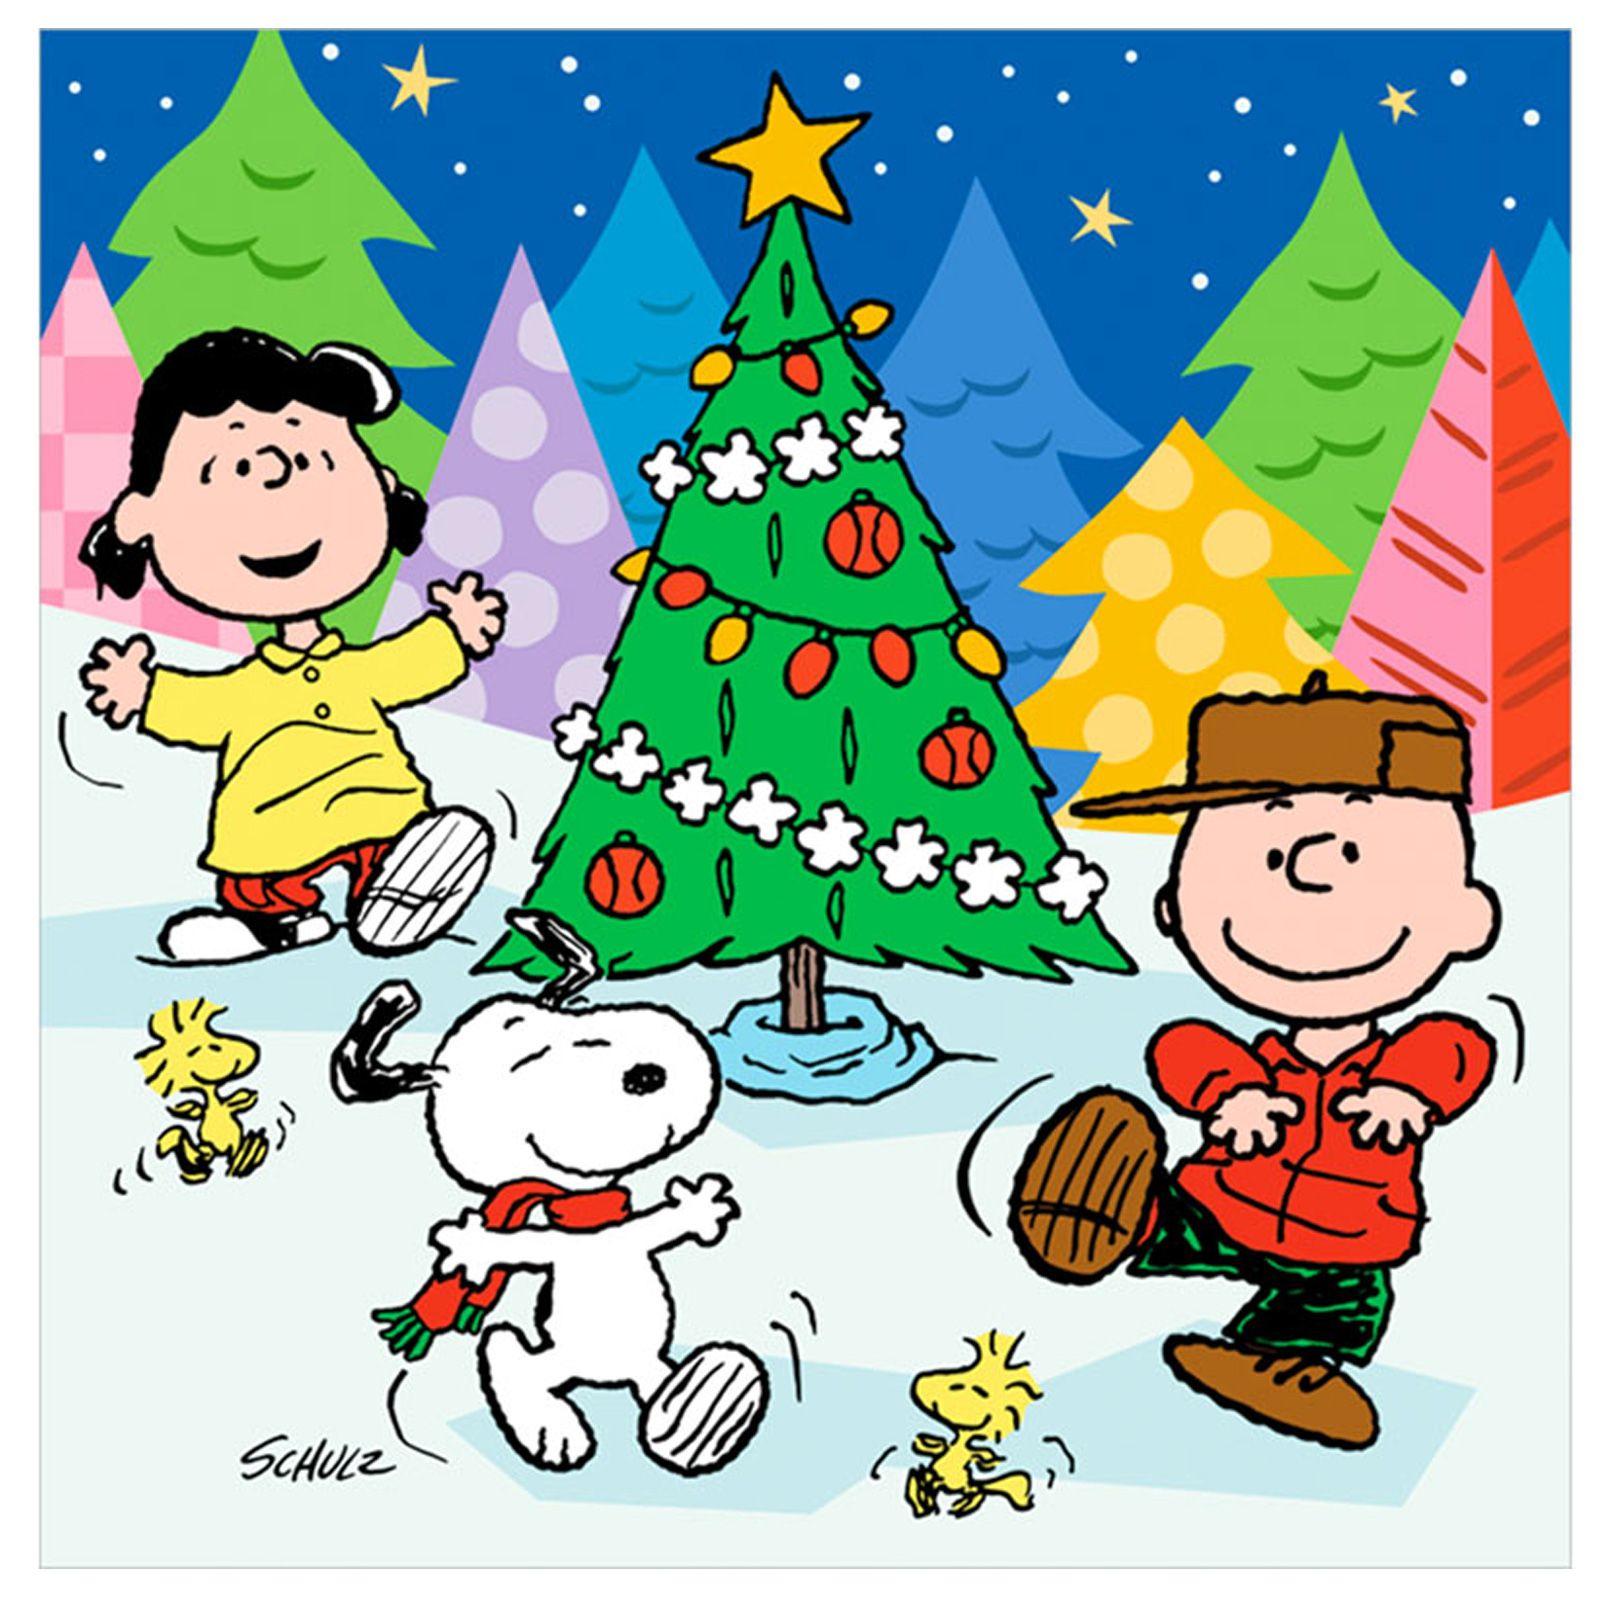 Charlie Brown Peanuts Comics Snoopy Christmas F Wallpaper.